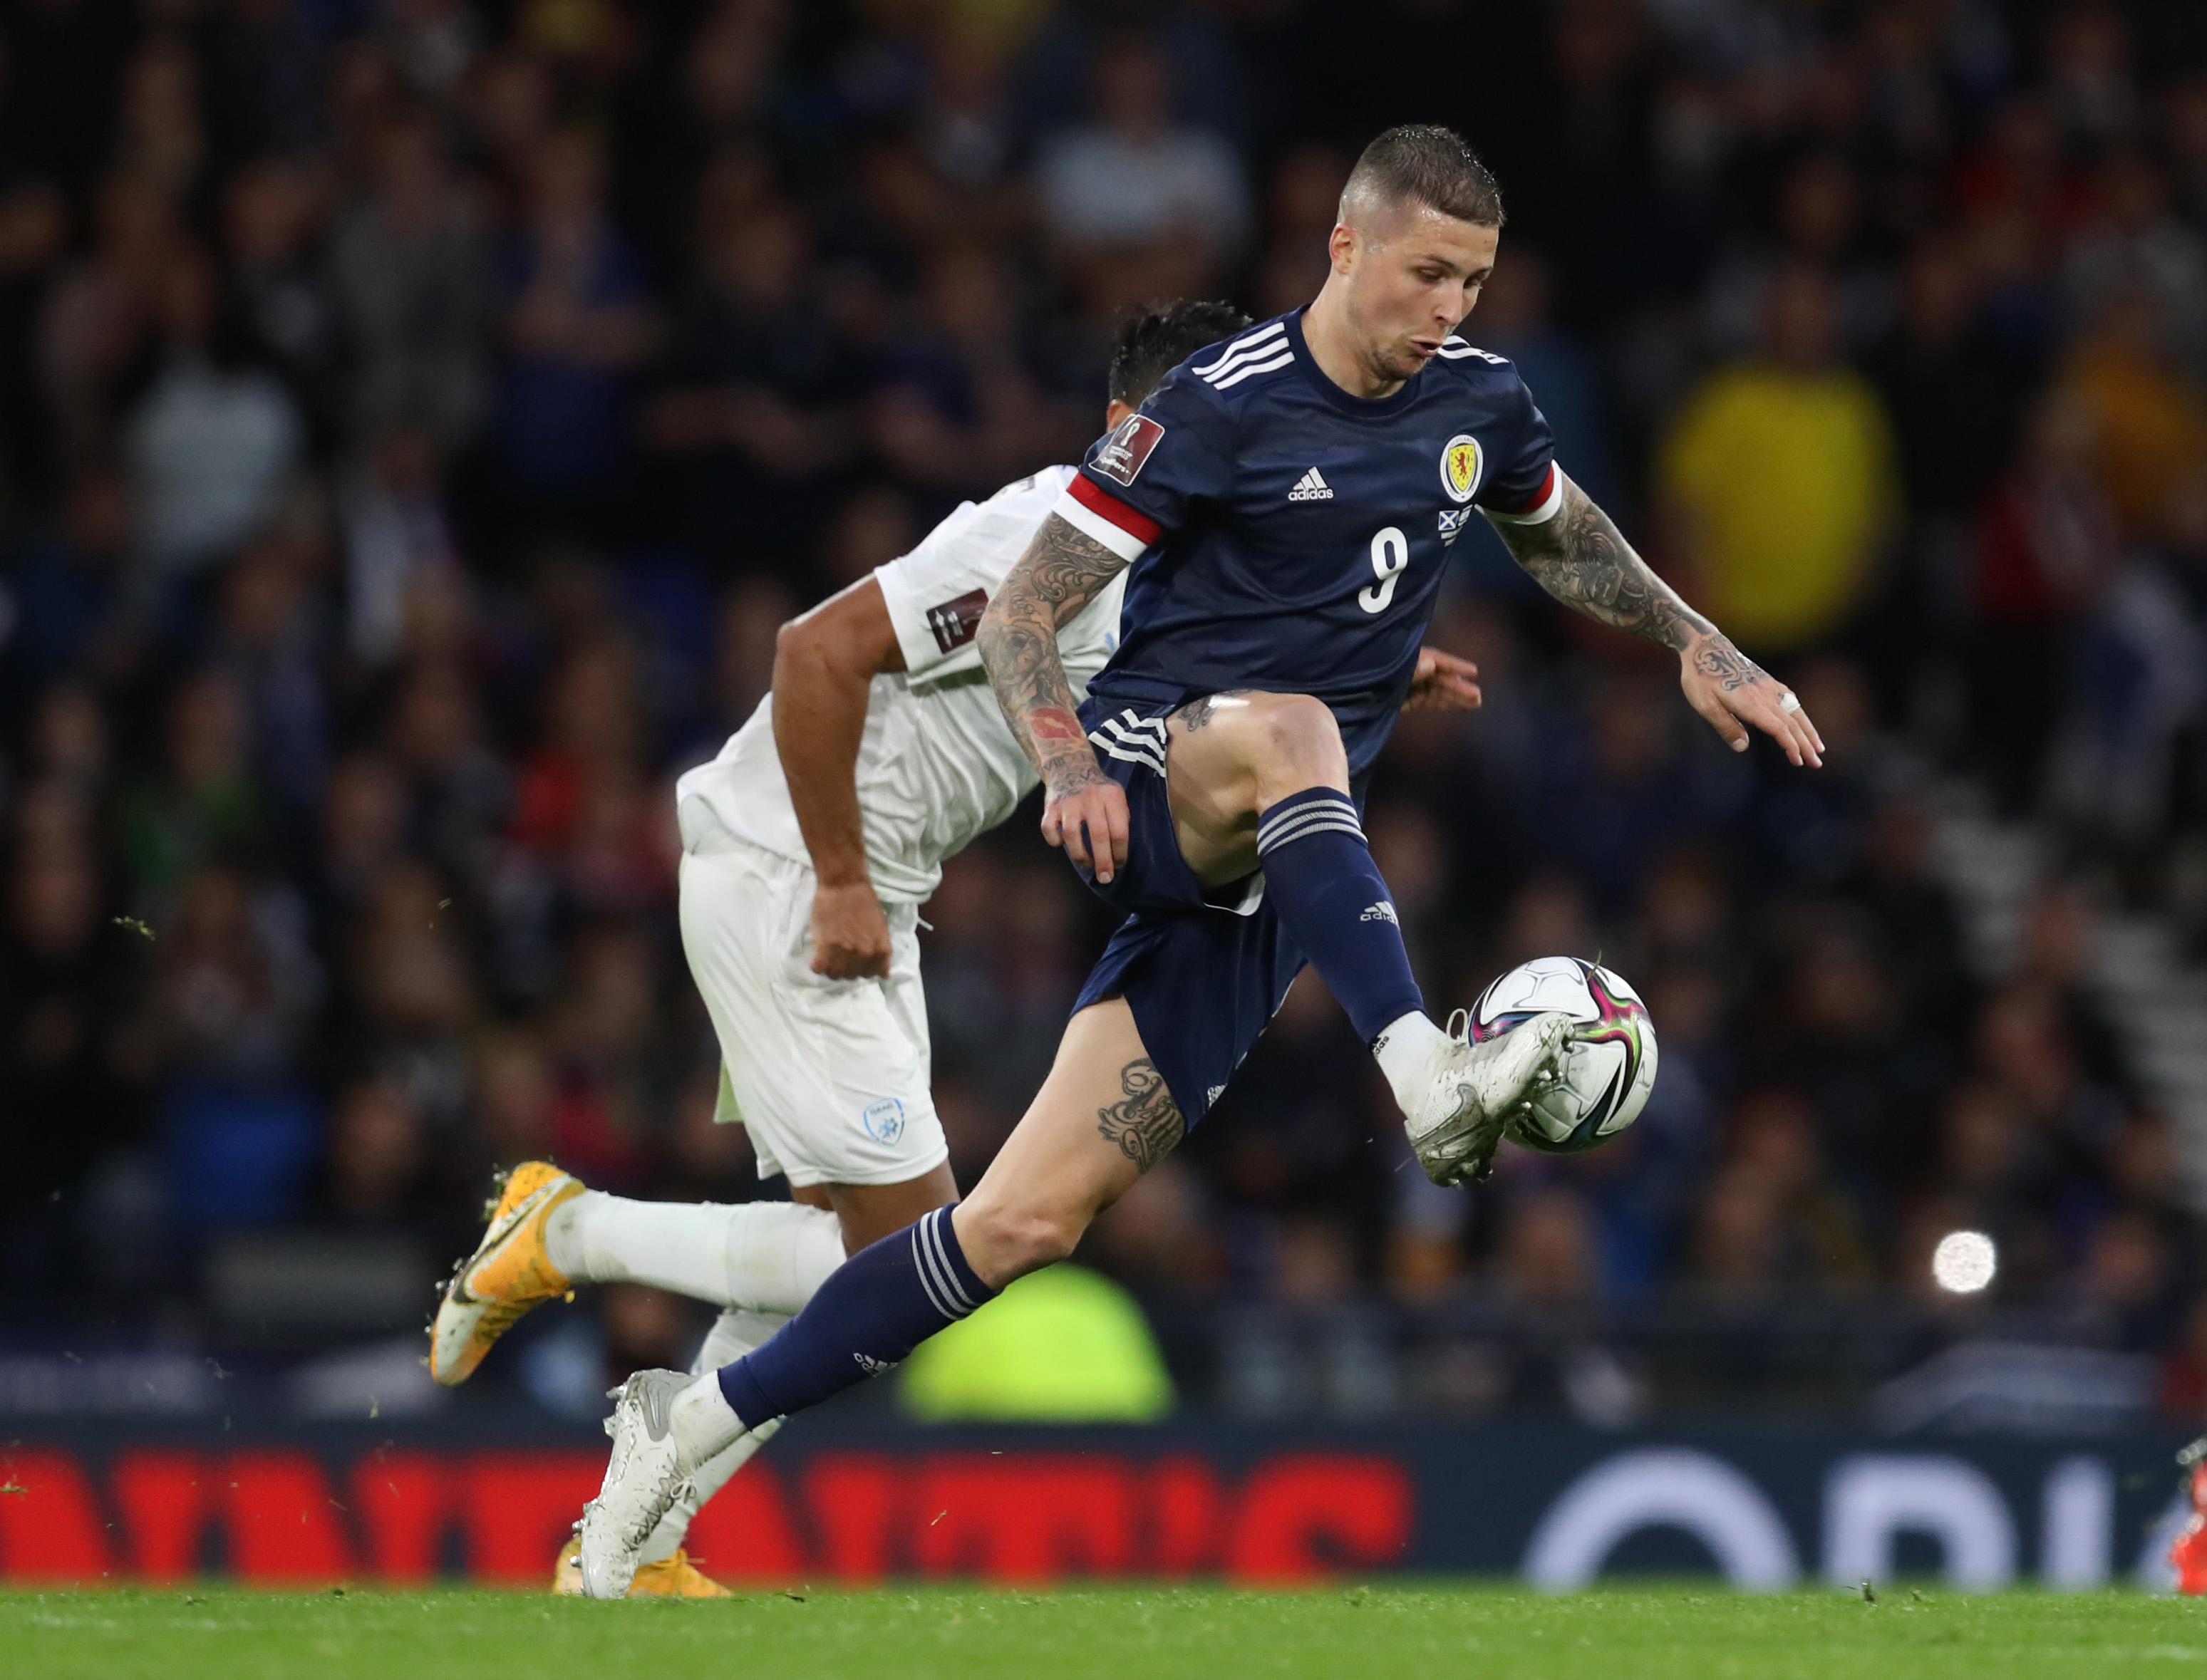 Soccer Football - World Cup - UEFA Qualifiers - Group F - Scotland v Israel - Hampden Park, Glasgow, Scotland, Britain - October 9, 2021  Scotland's Lyndon Dykes REUTERS/Russell Cheyne